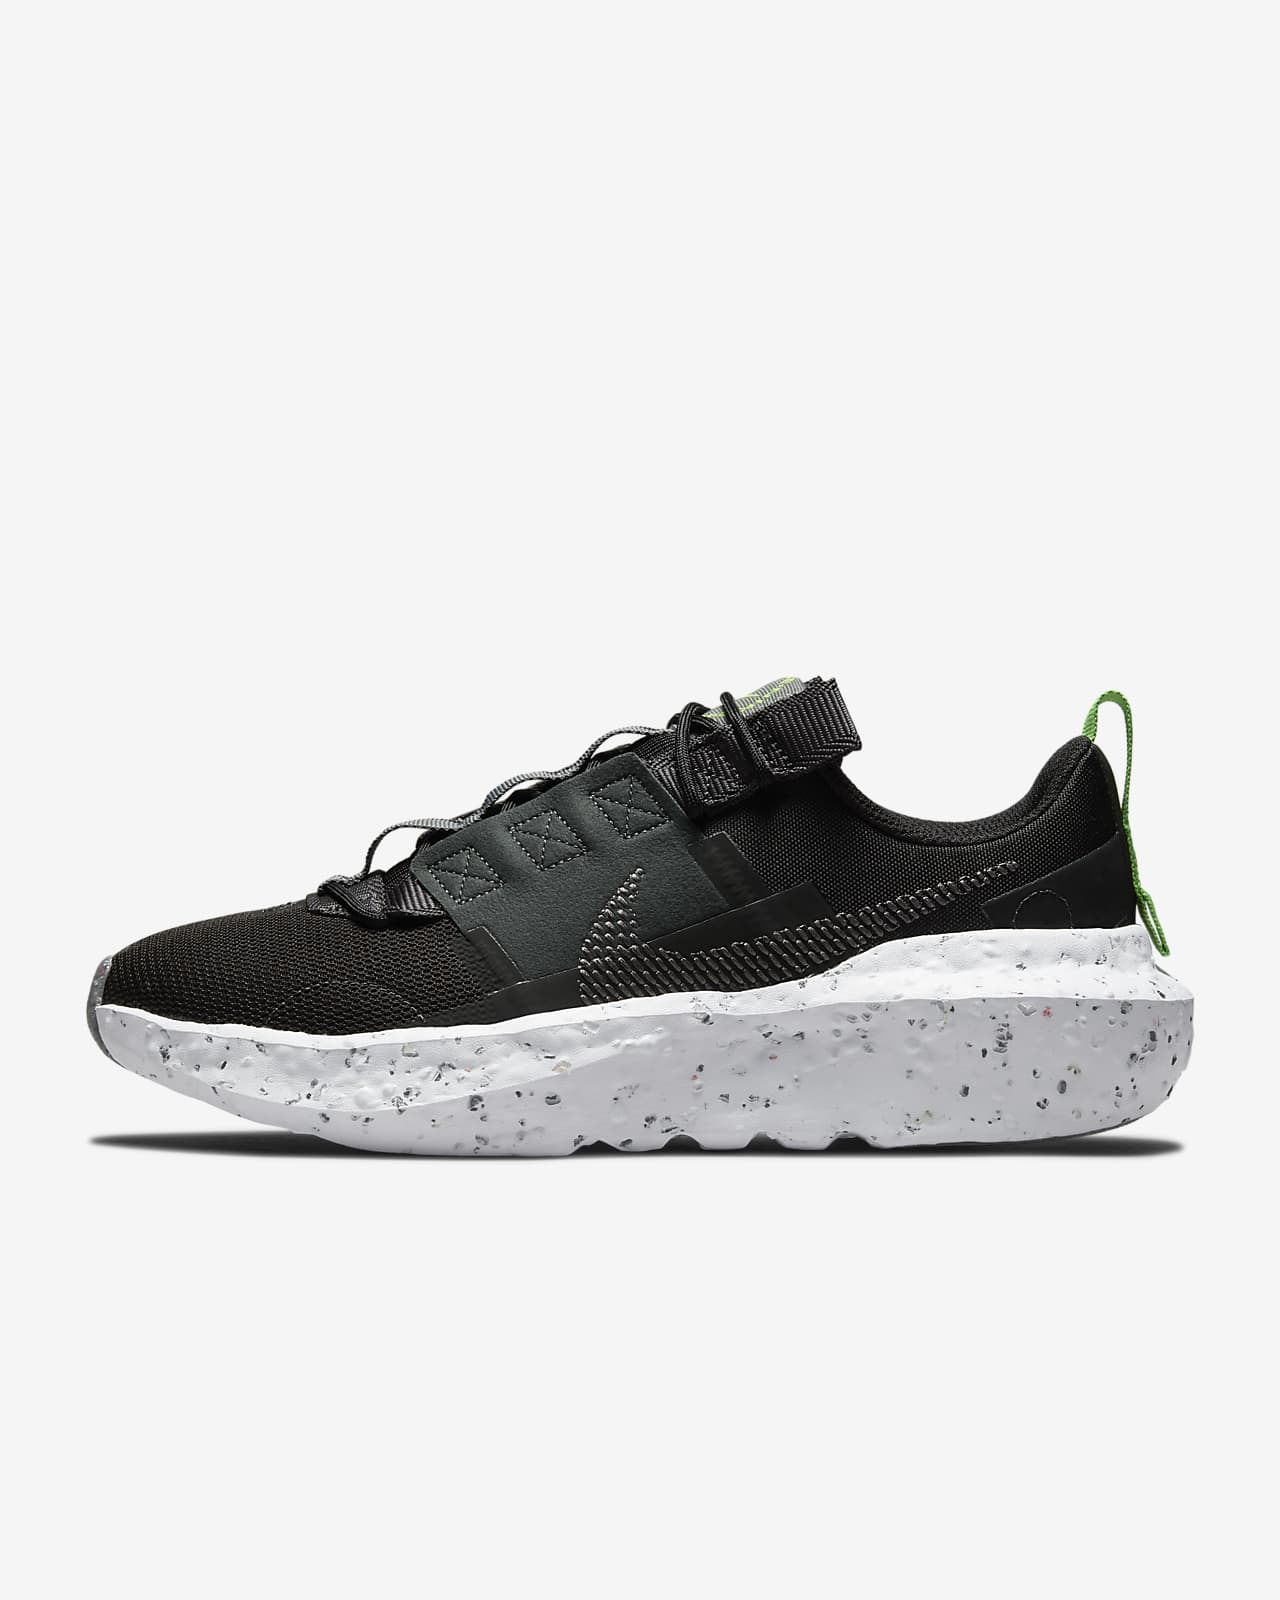 Sapatilhas Nike Crater Impact para mulher